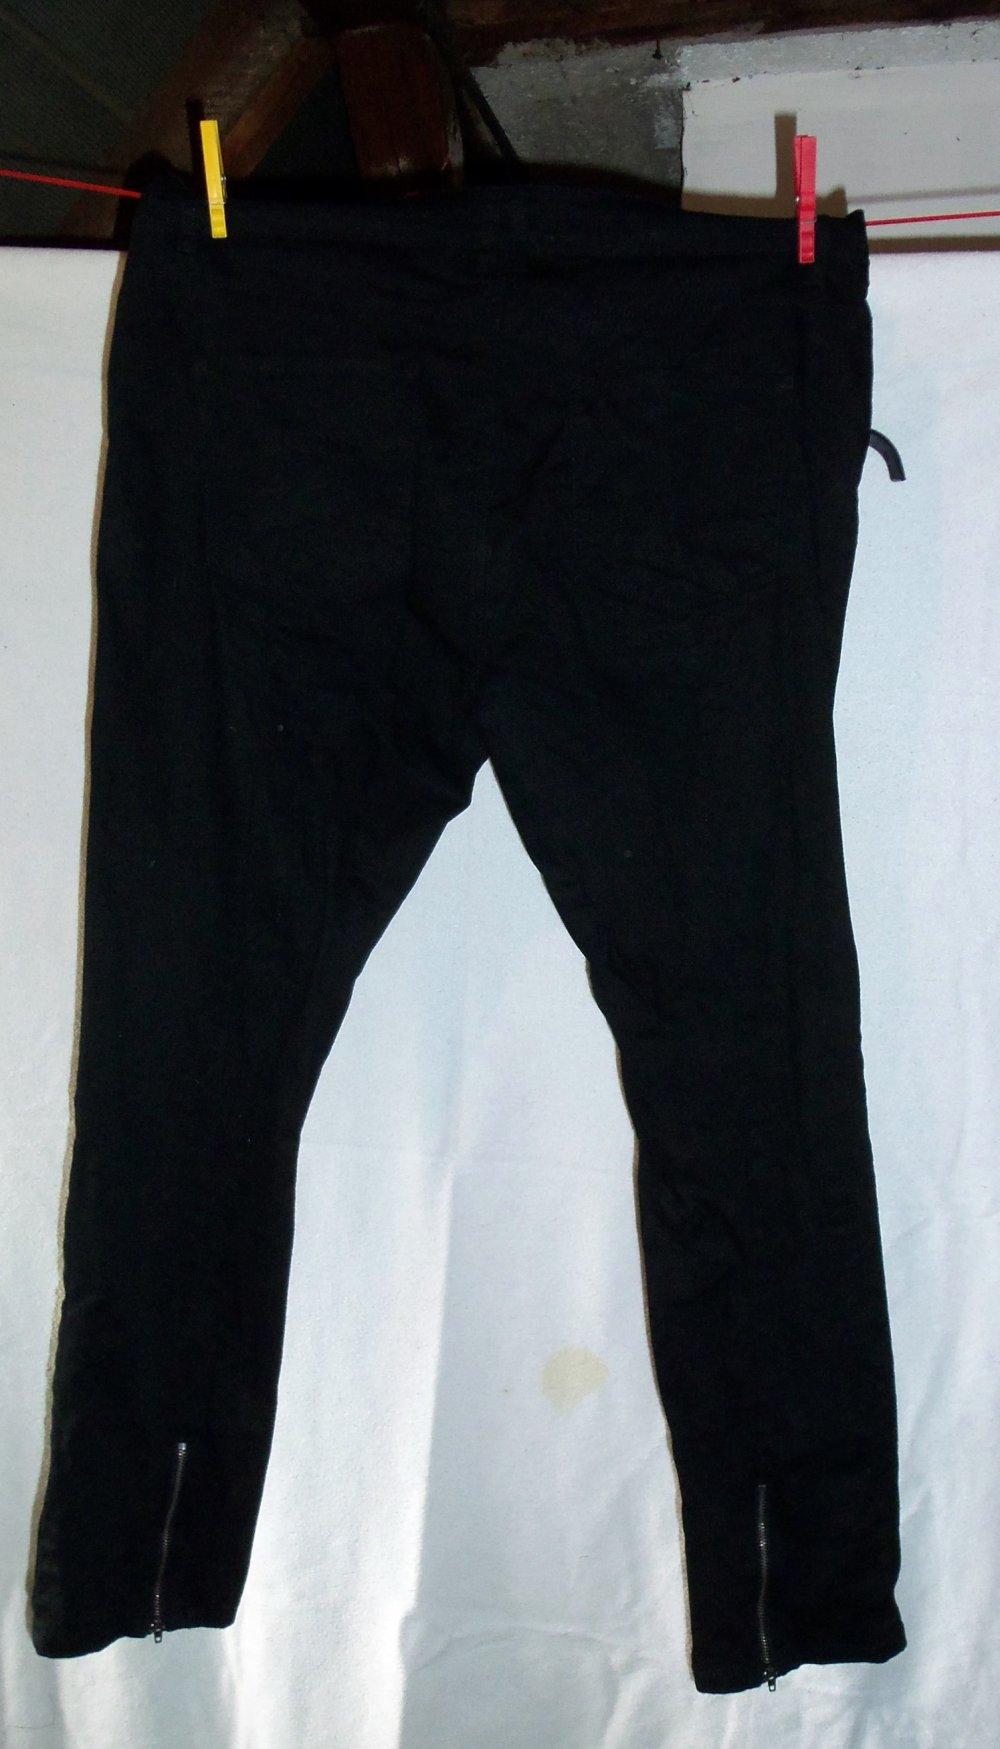 8669228eb04e Janina Denim - Jeans schwarz Größe 46    Kleiderkorb.de